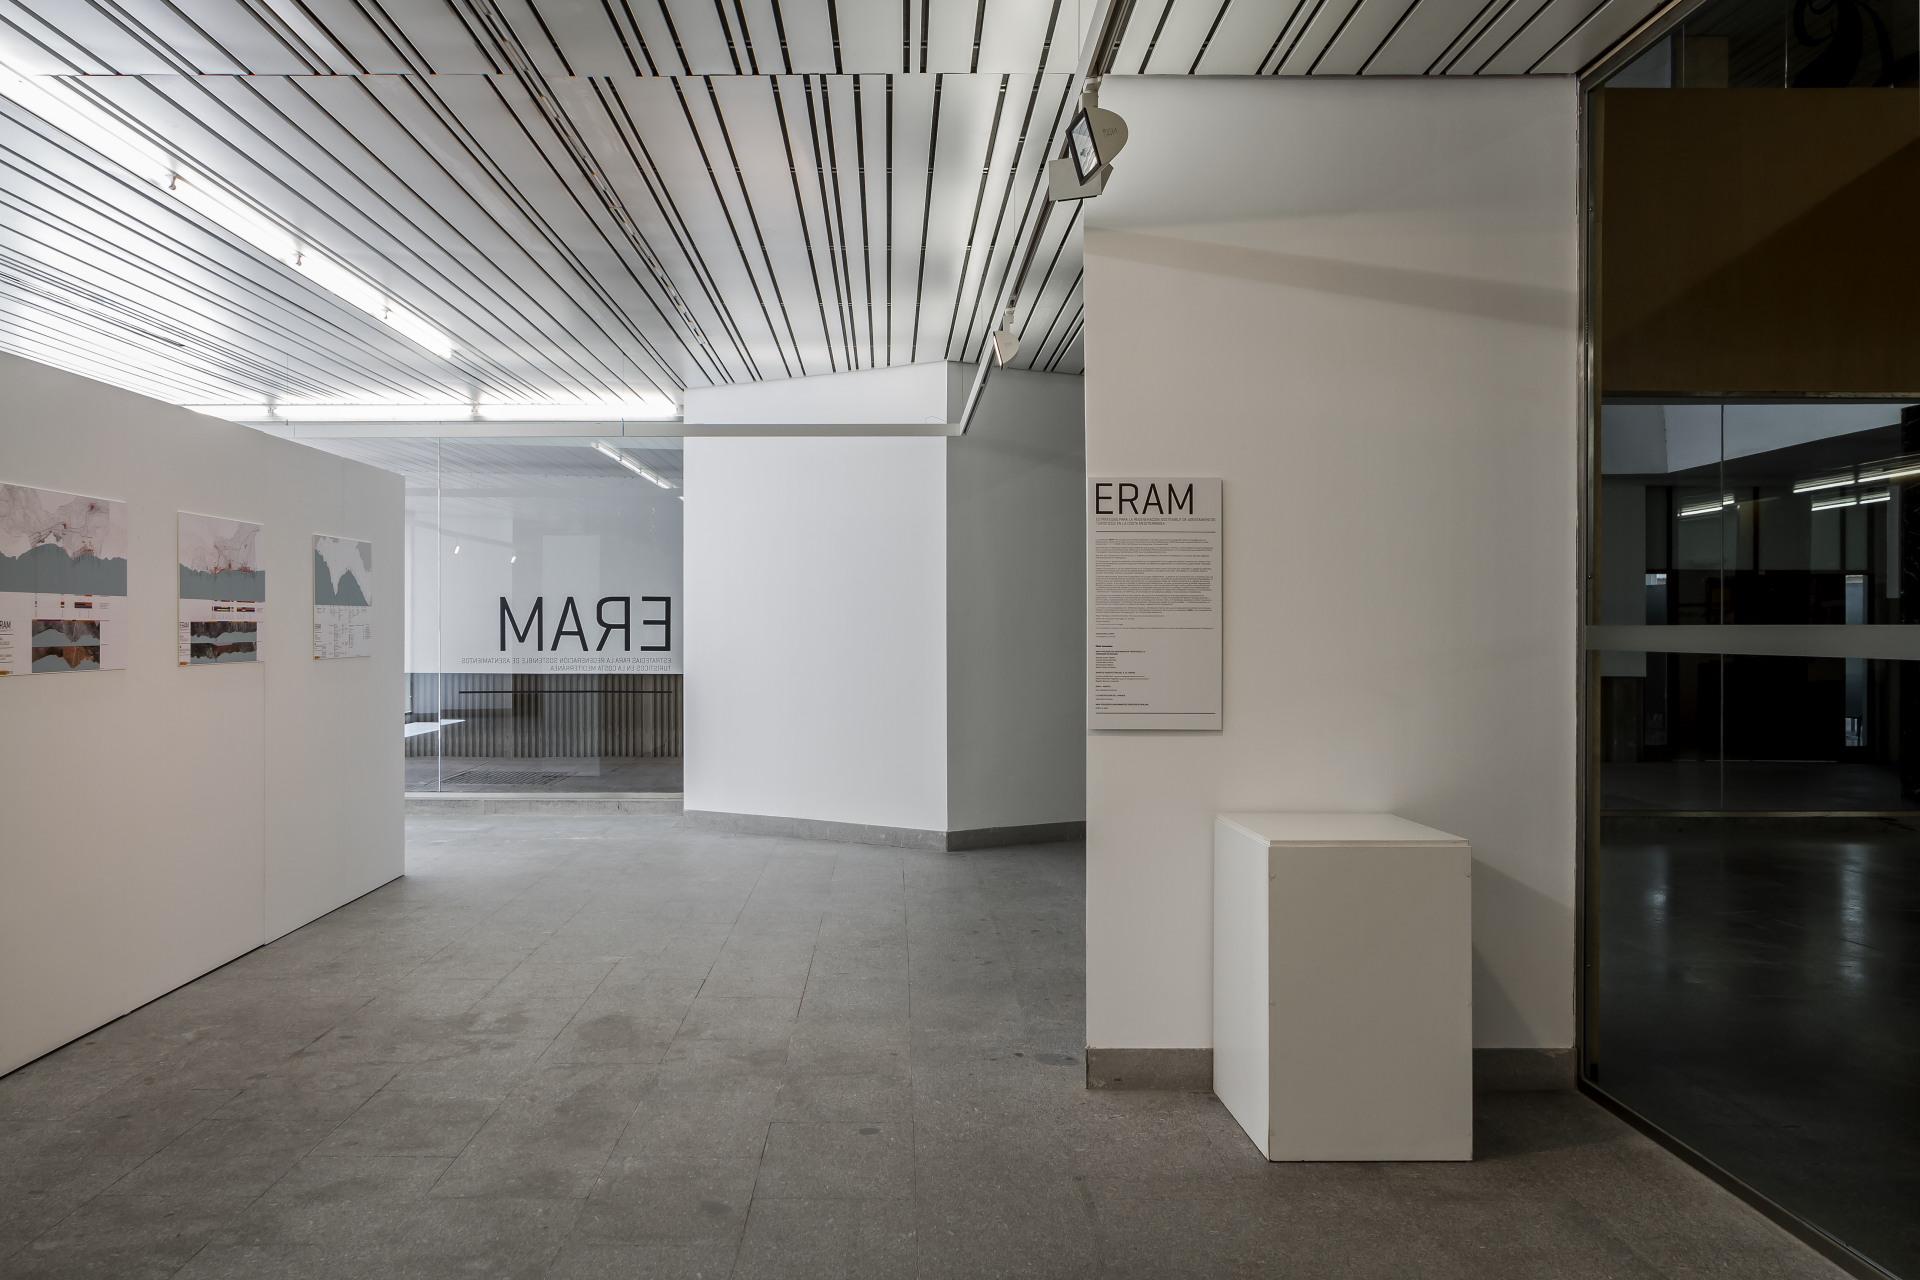 fotografia-arquitectura-valencia-german-cabo-upv-etsav-eram-exposicion (4)